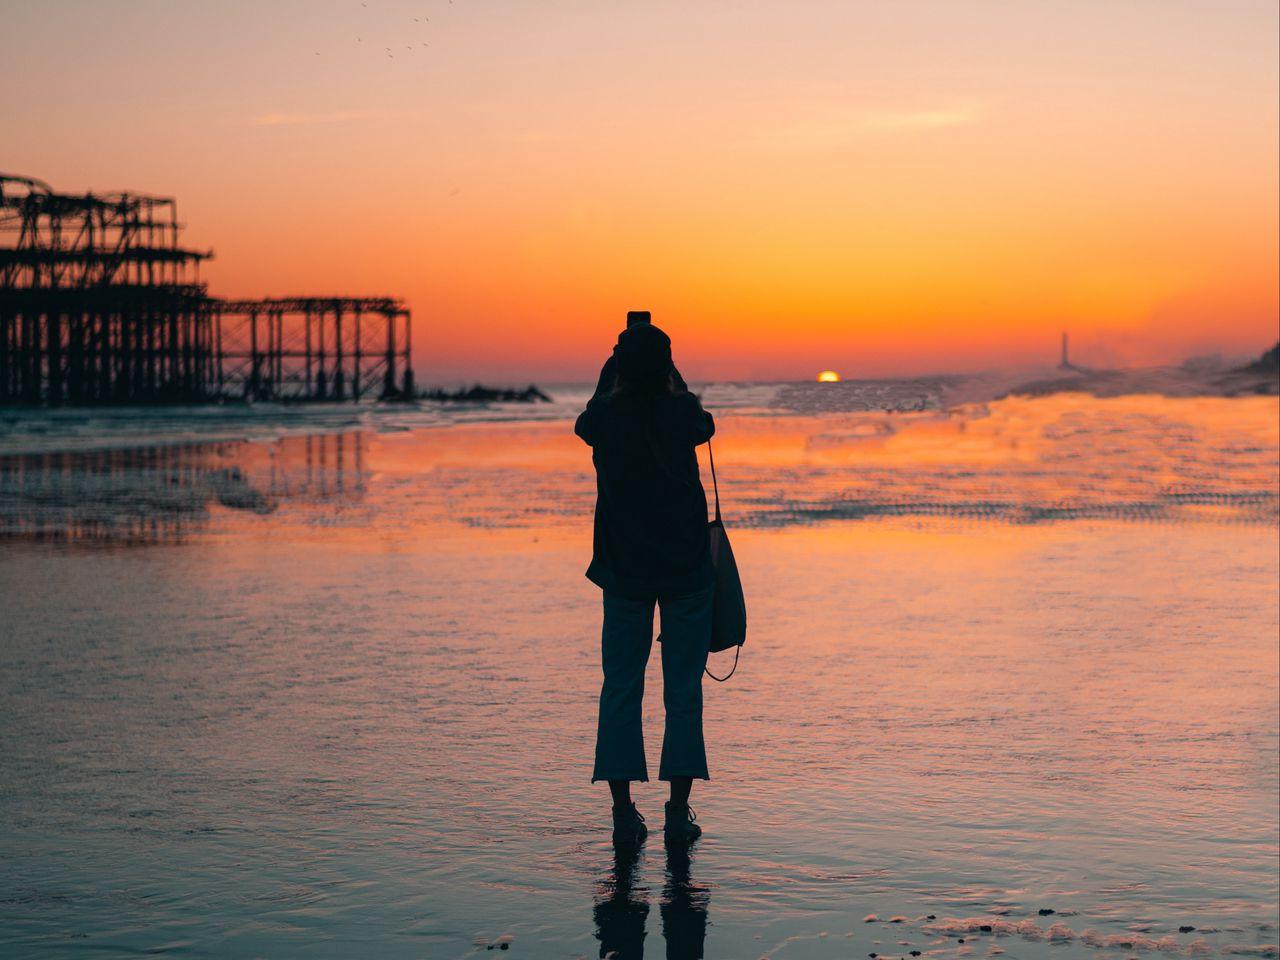 1280x960 Wallpaper silhouette, alone, beach, sea, sunset, dark